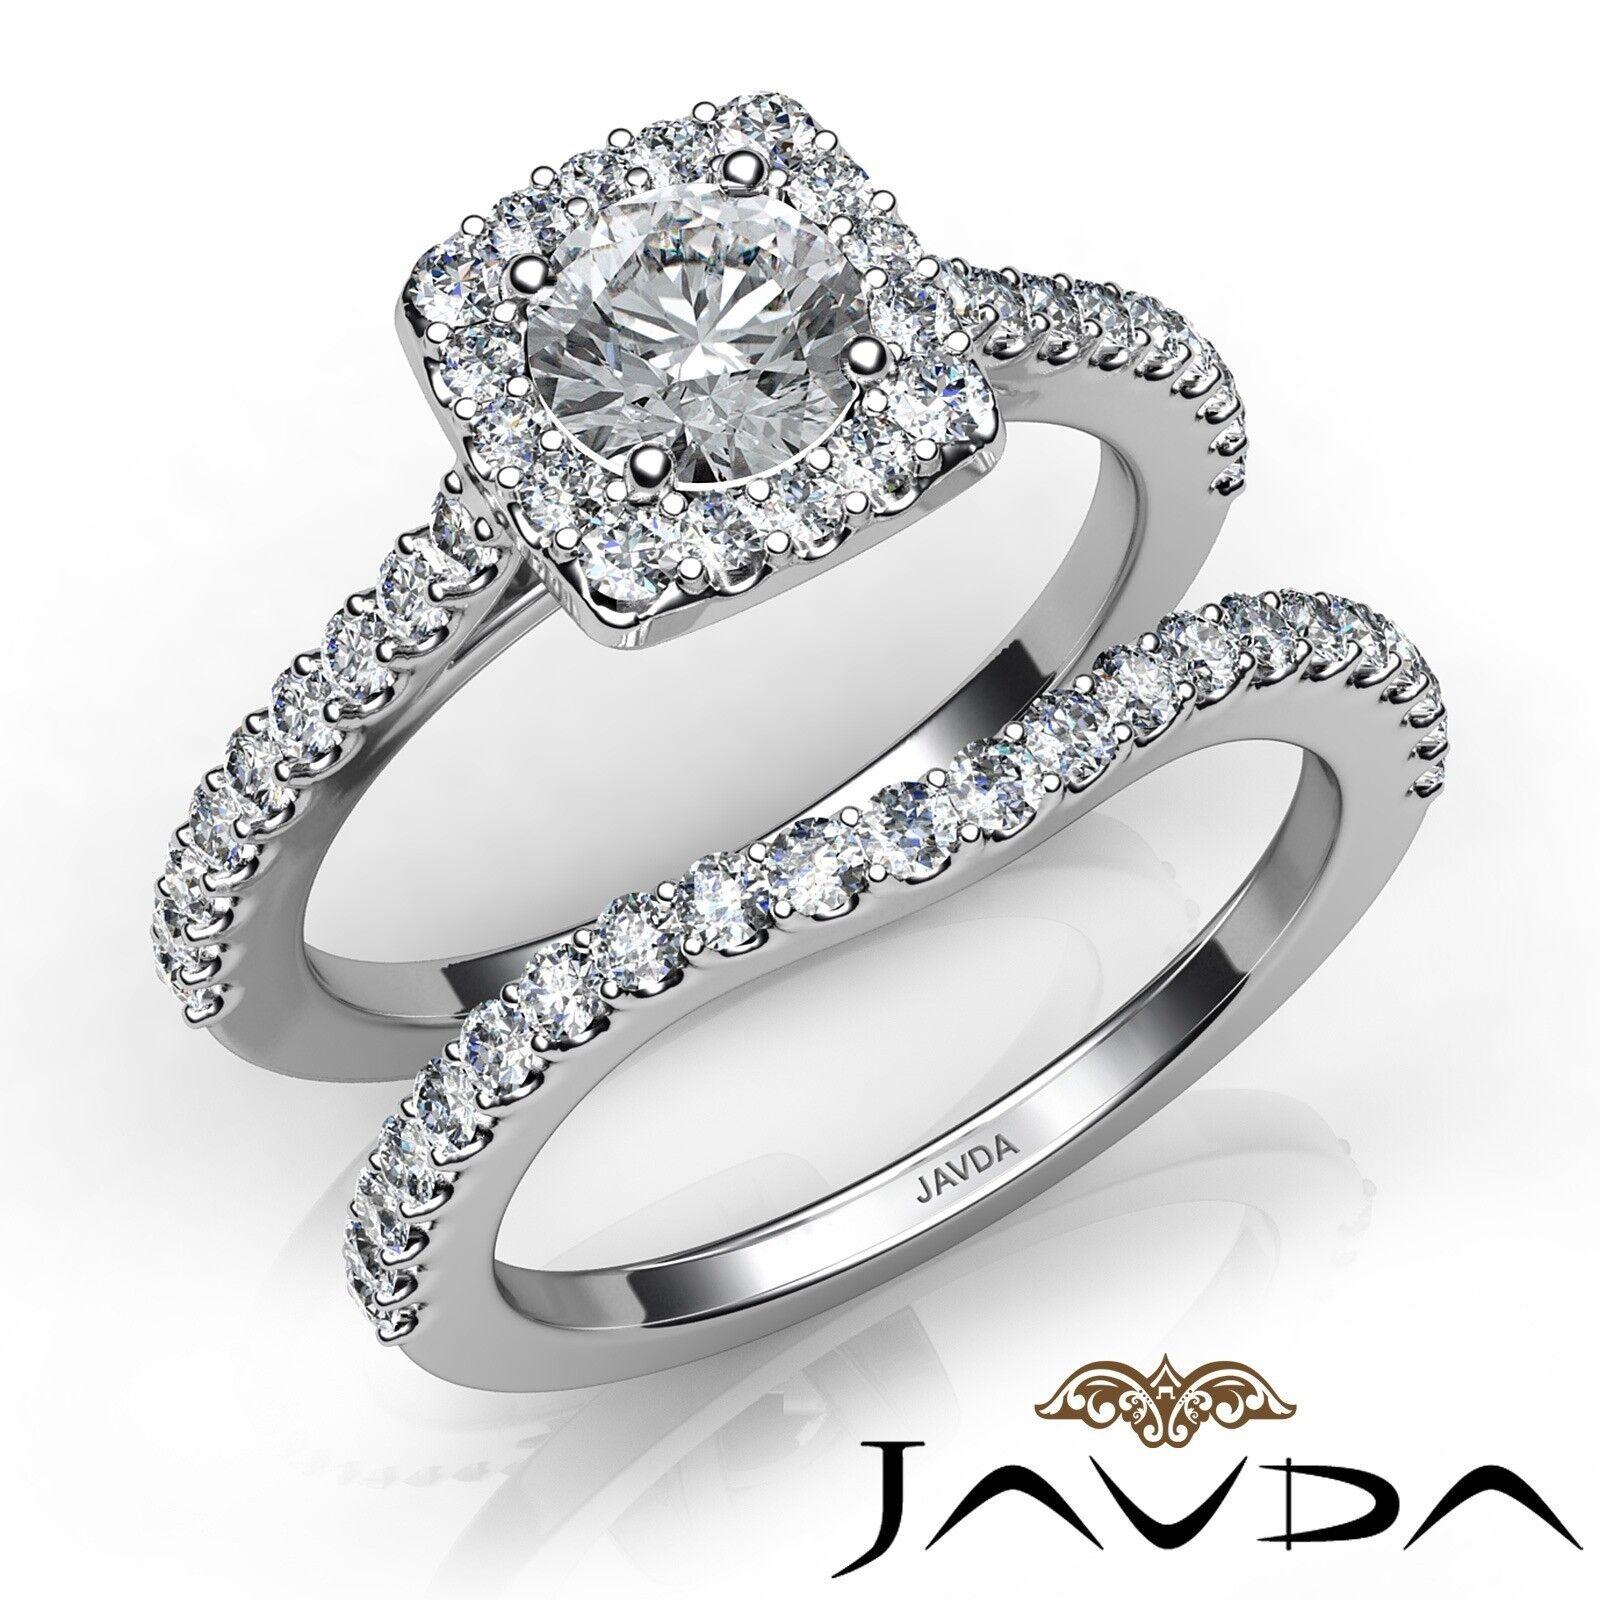 1.46ctw Halo U Prong Bridal Set Round Diamond Engagement Ring GIA E-VS2 W Gold